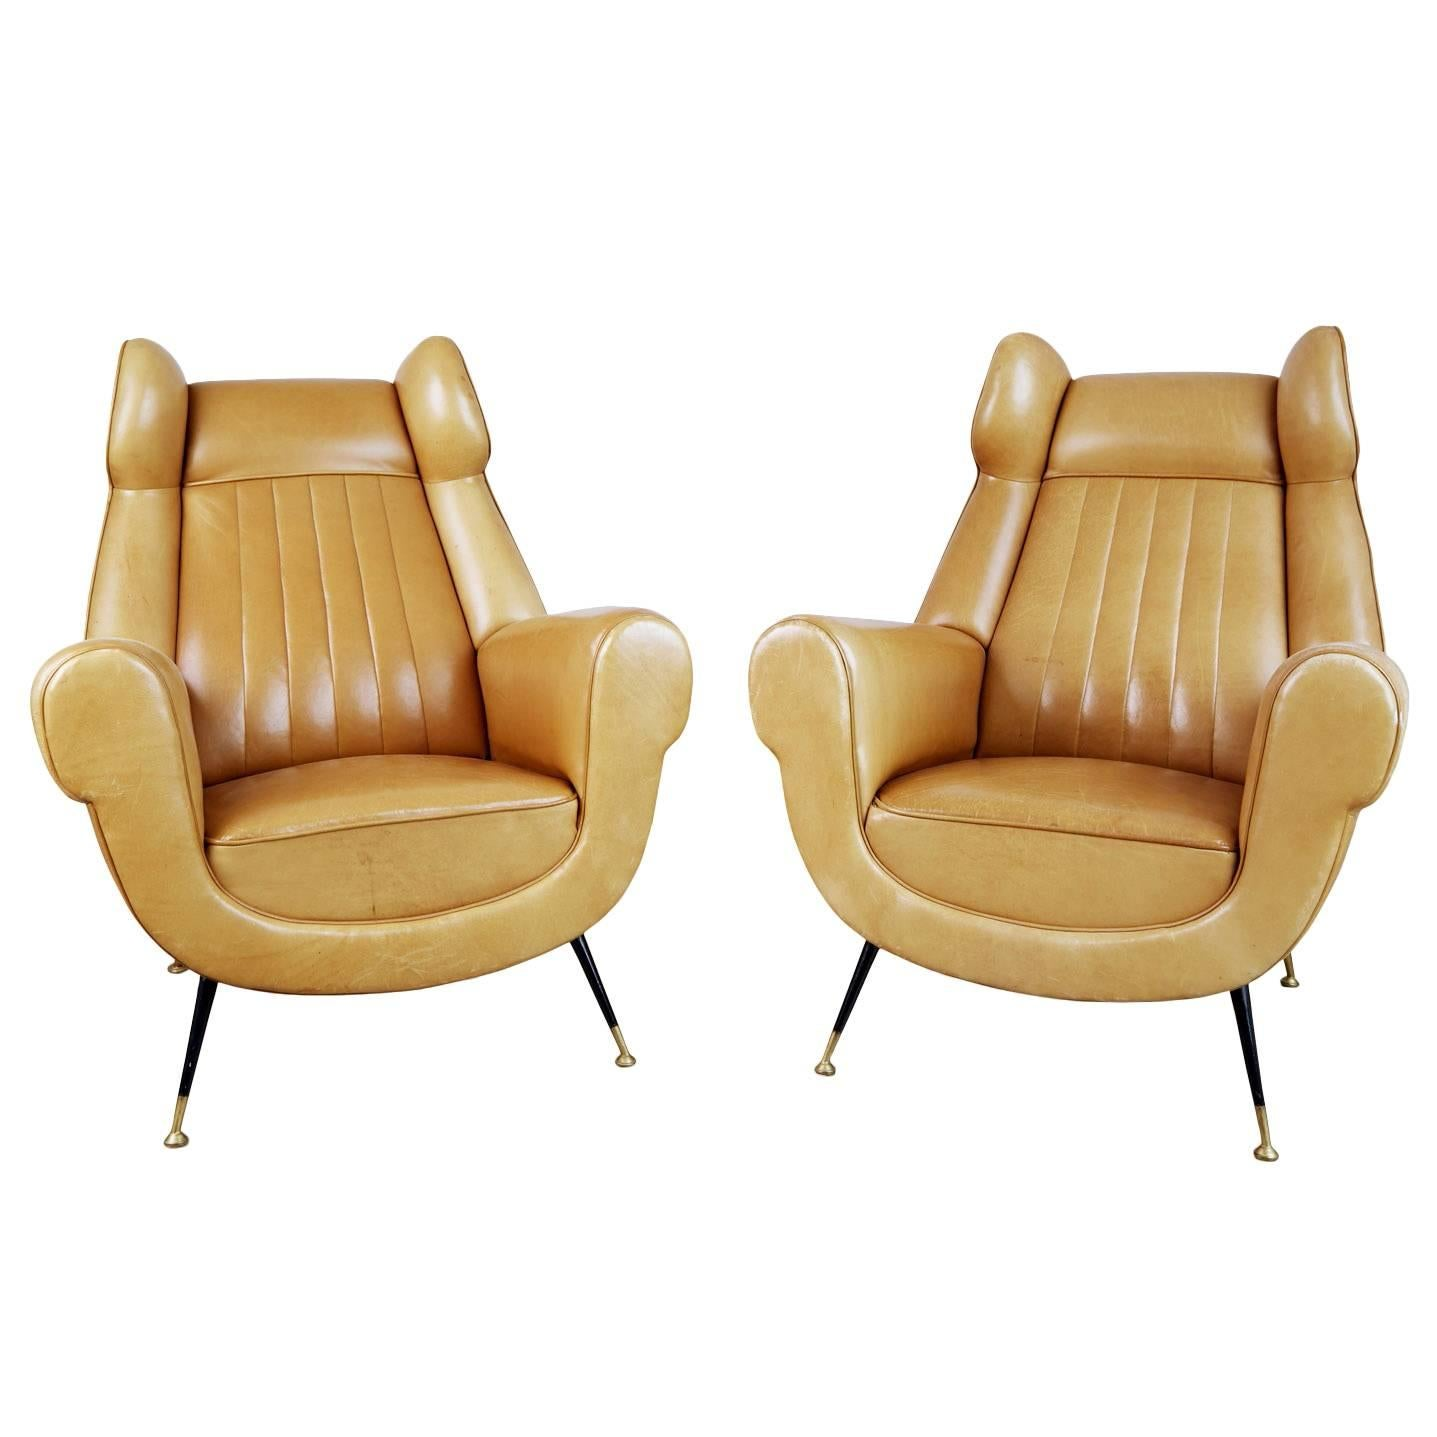 Gigi Radice for Minotti Leather Wingback Chairs, Pair, Italy circa 1960